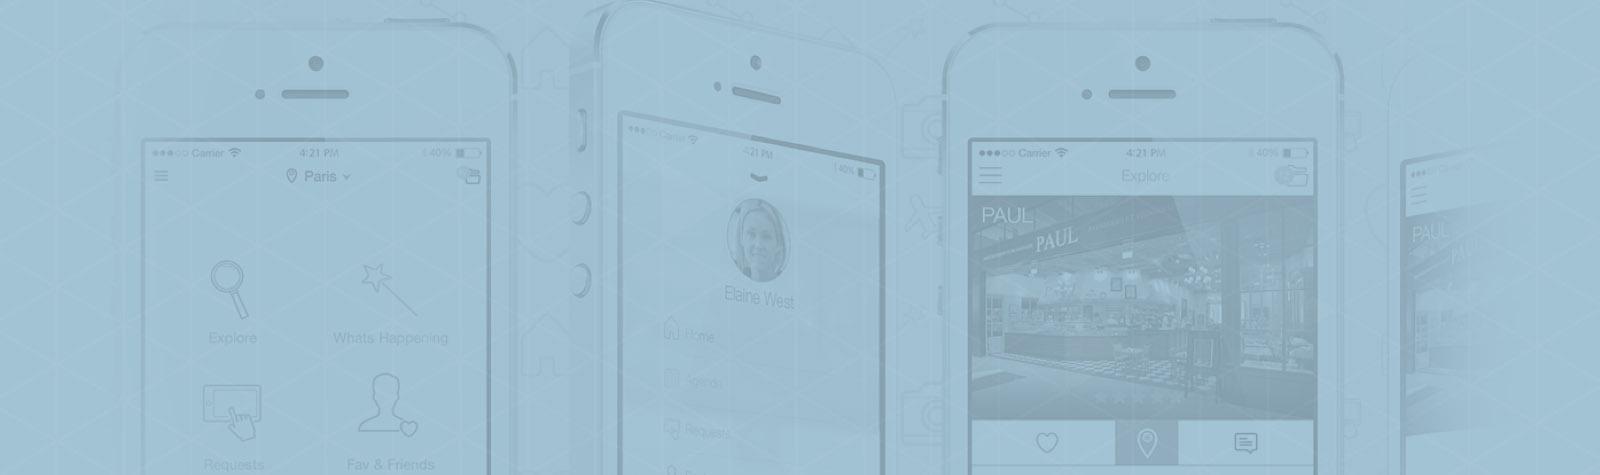 live life app case study